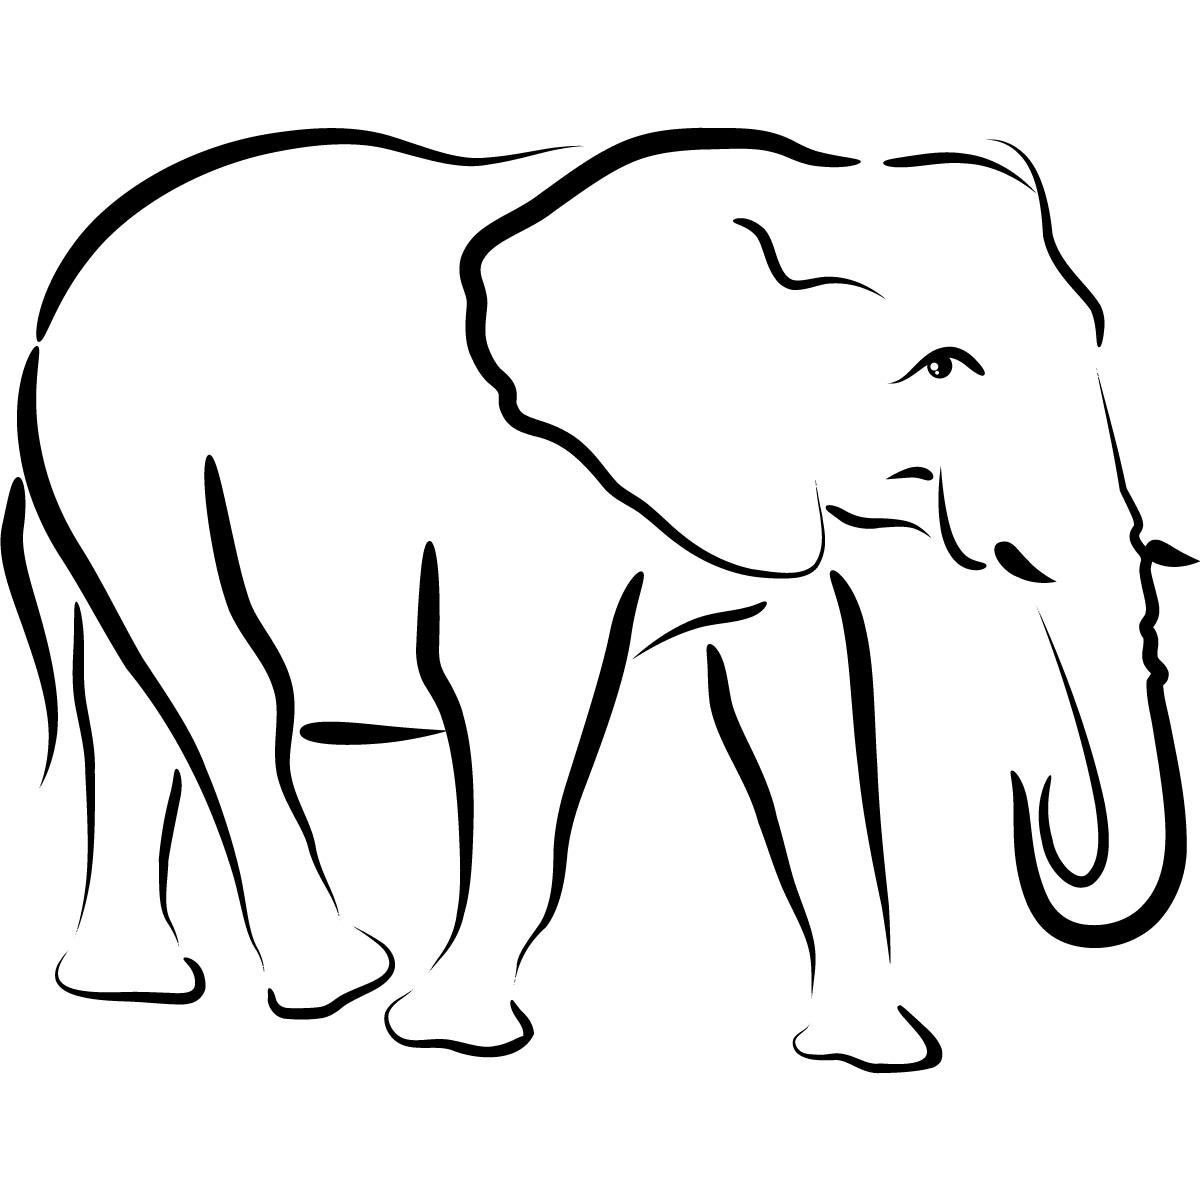 Line Drawing Elephant Head : Elephant head outline clipart panda free images